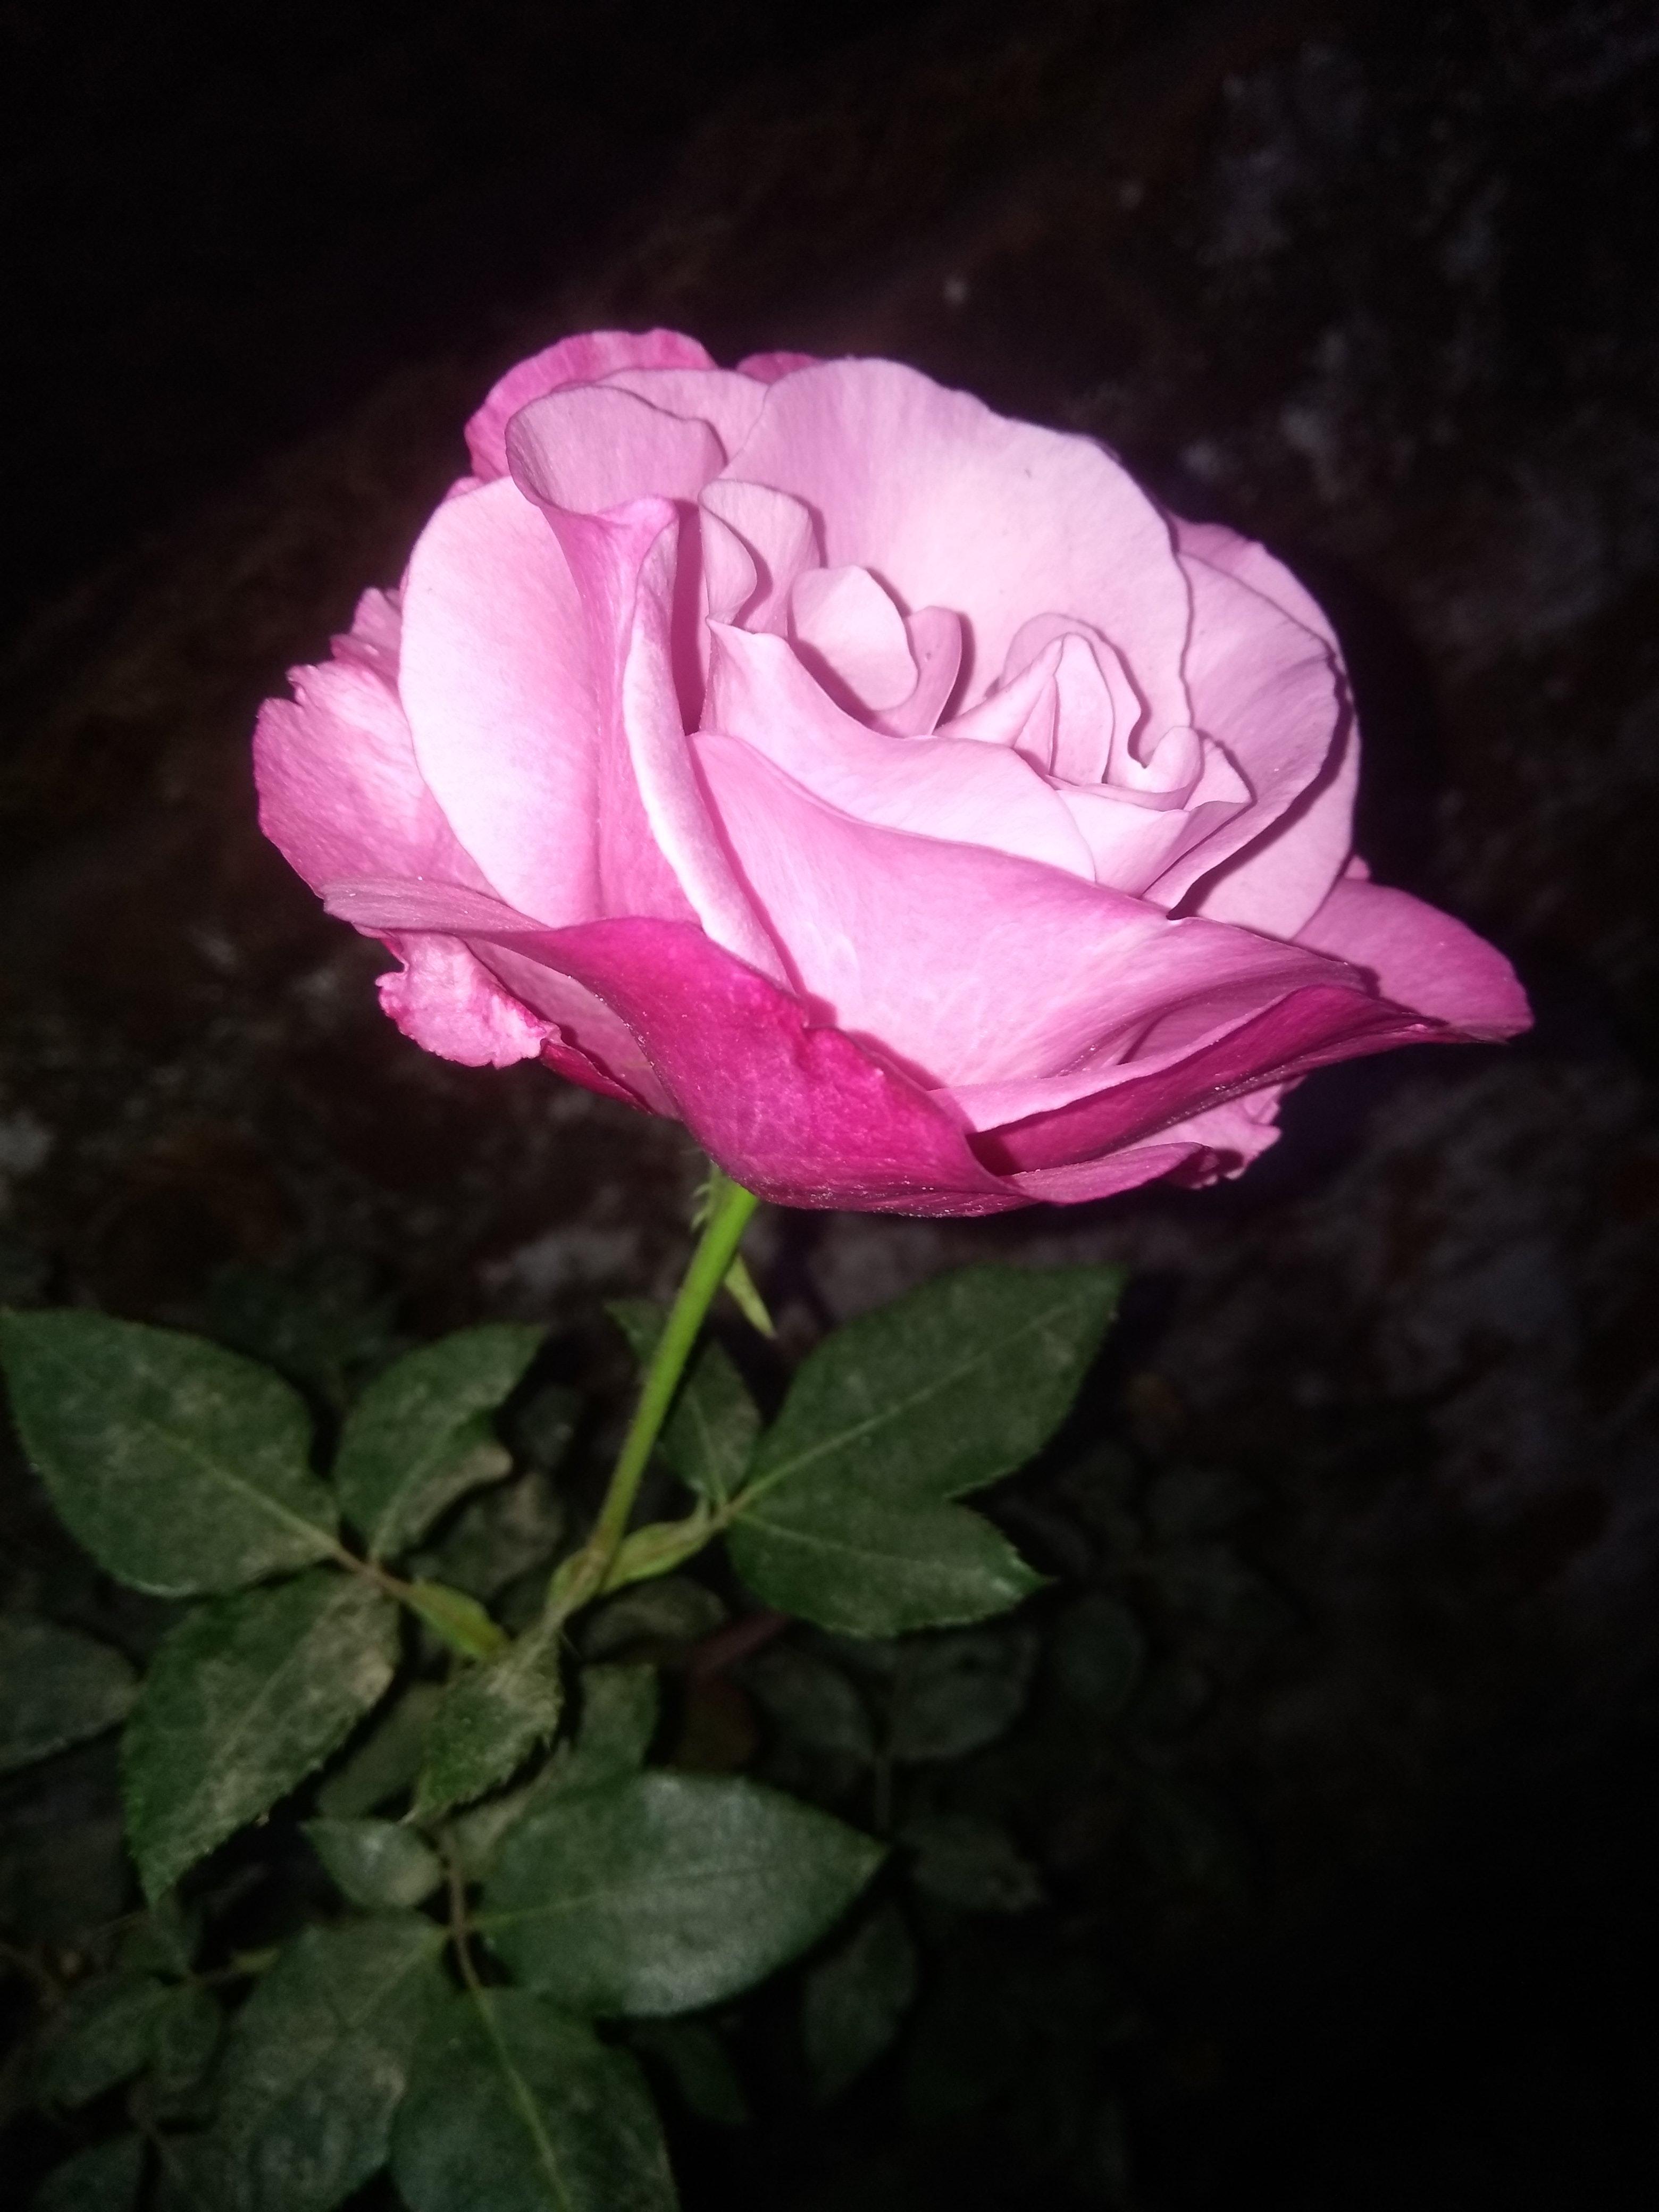 Unduh 6000 Koleksi Gambar Bunga Mawar Yang Indah Paling Cantik HD